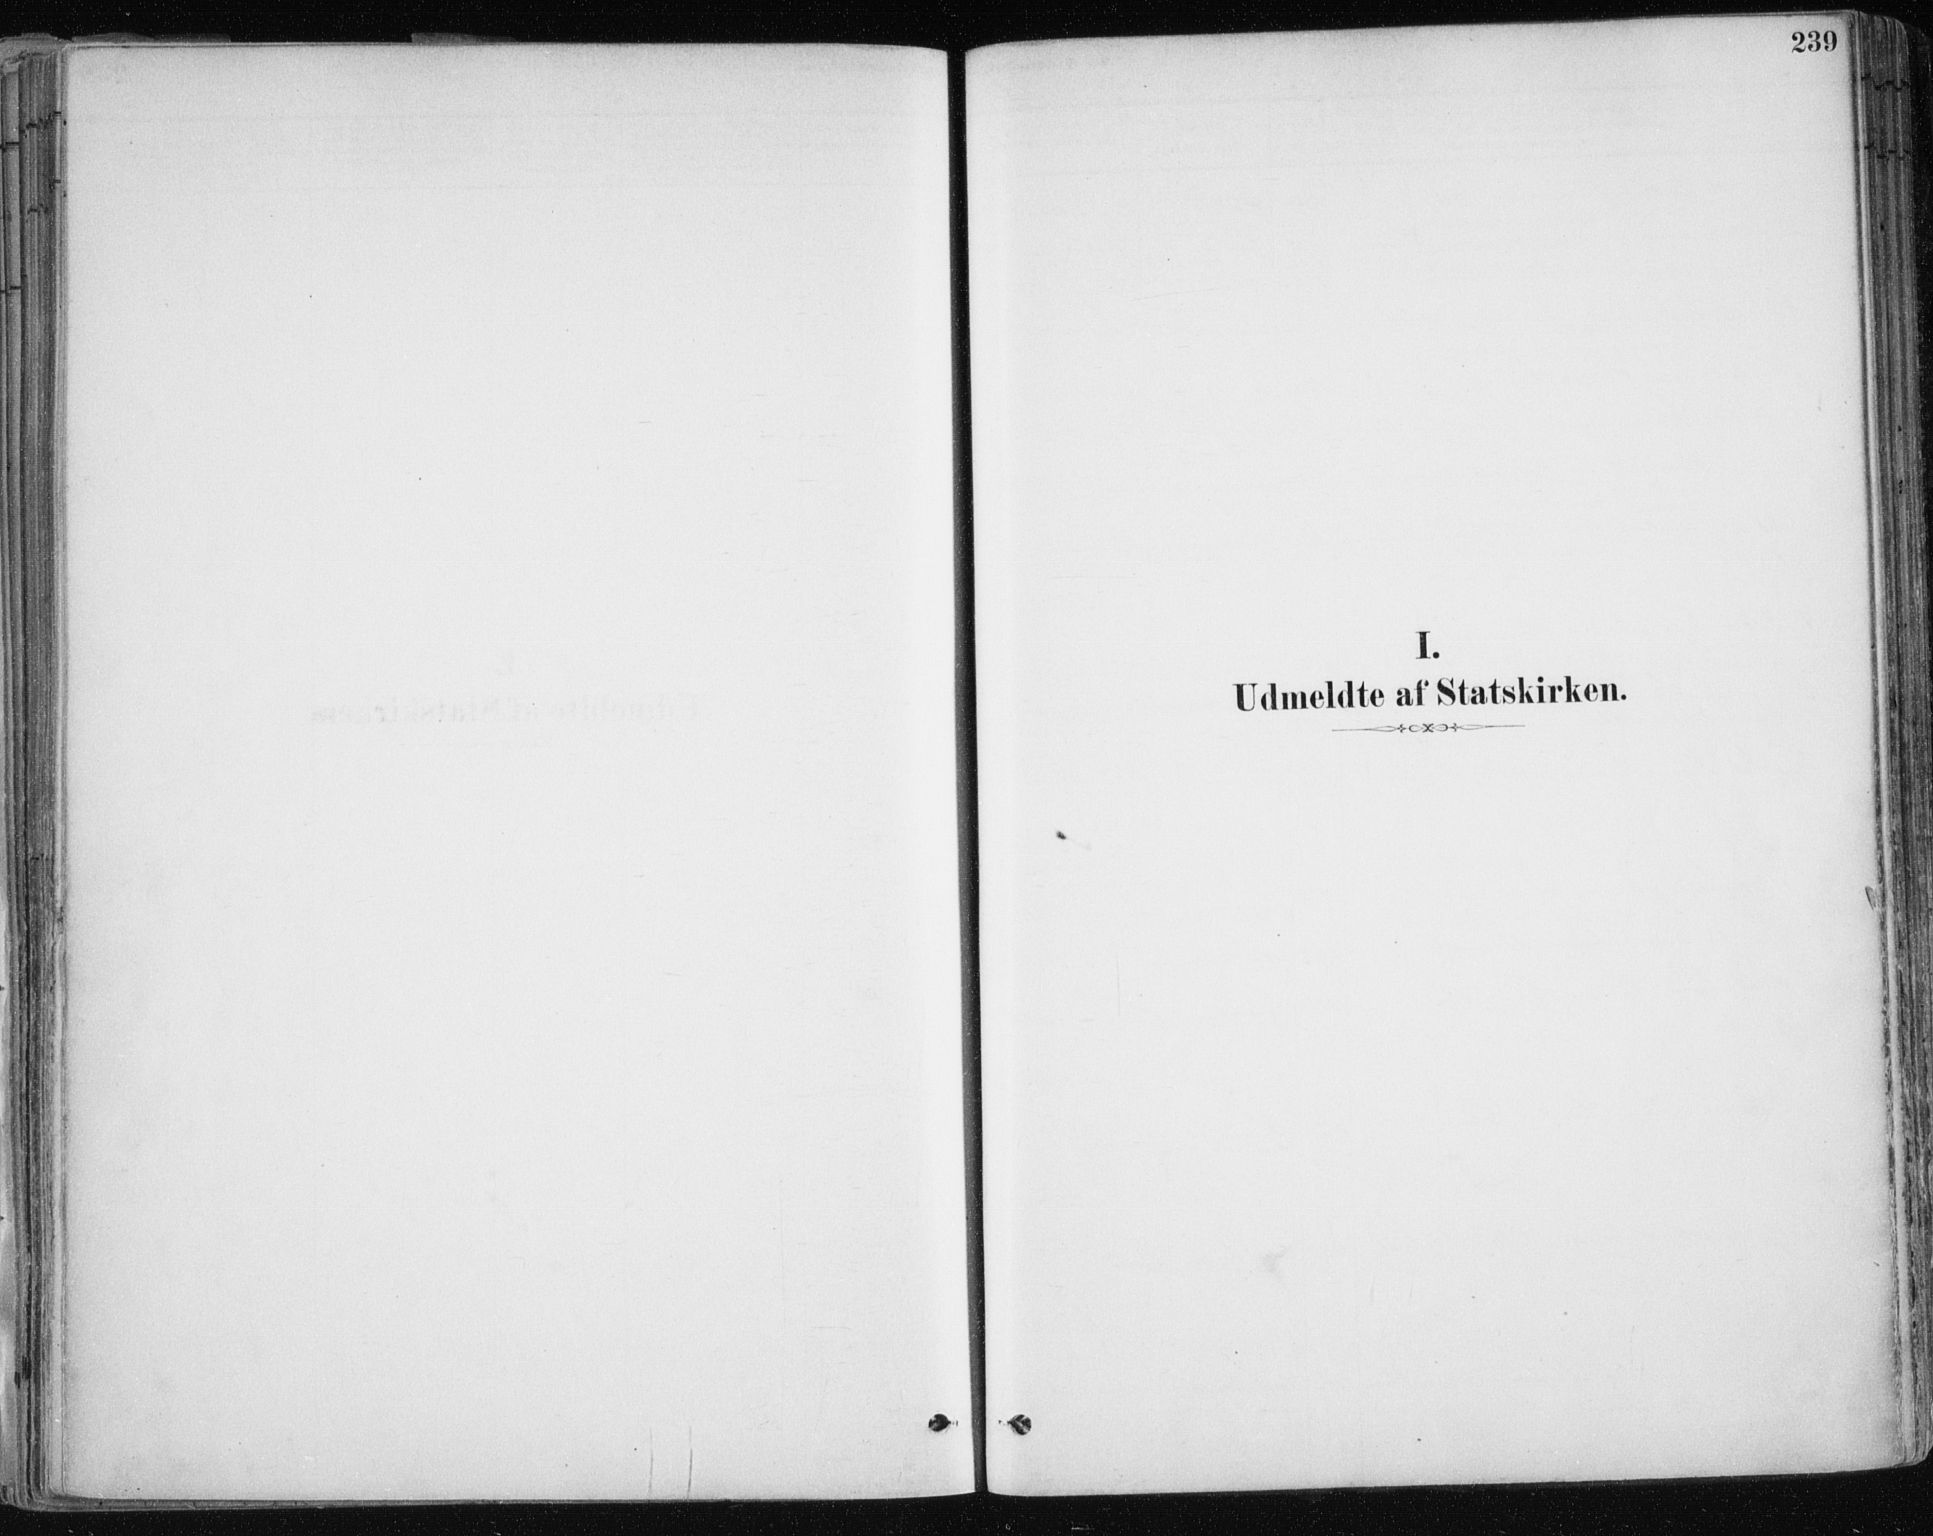 SATØ, Hammerfest sokneprestembete, Ministerialbok nr. 8, 1878-1889, s. 239